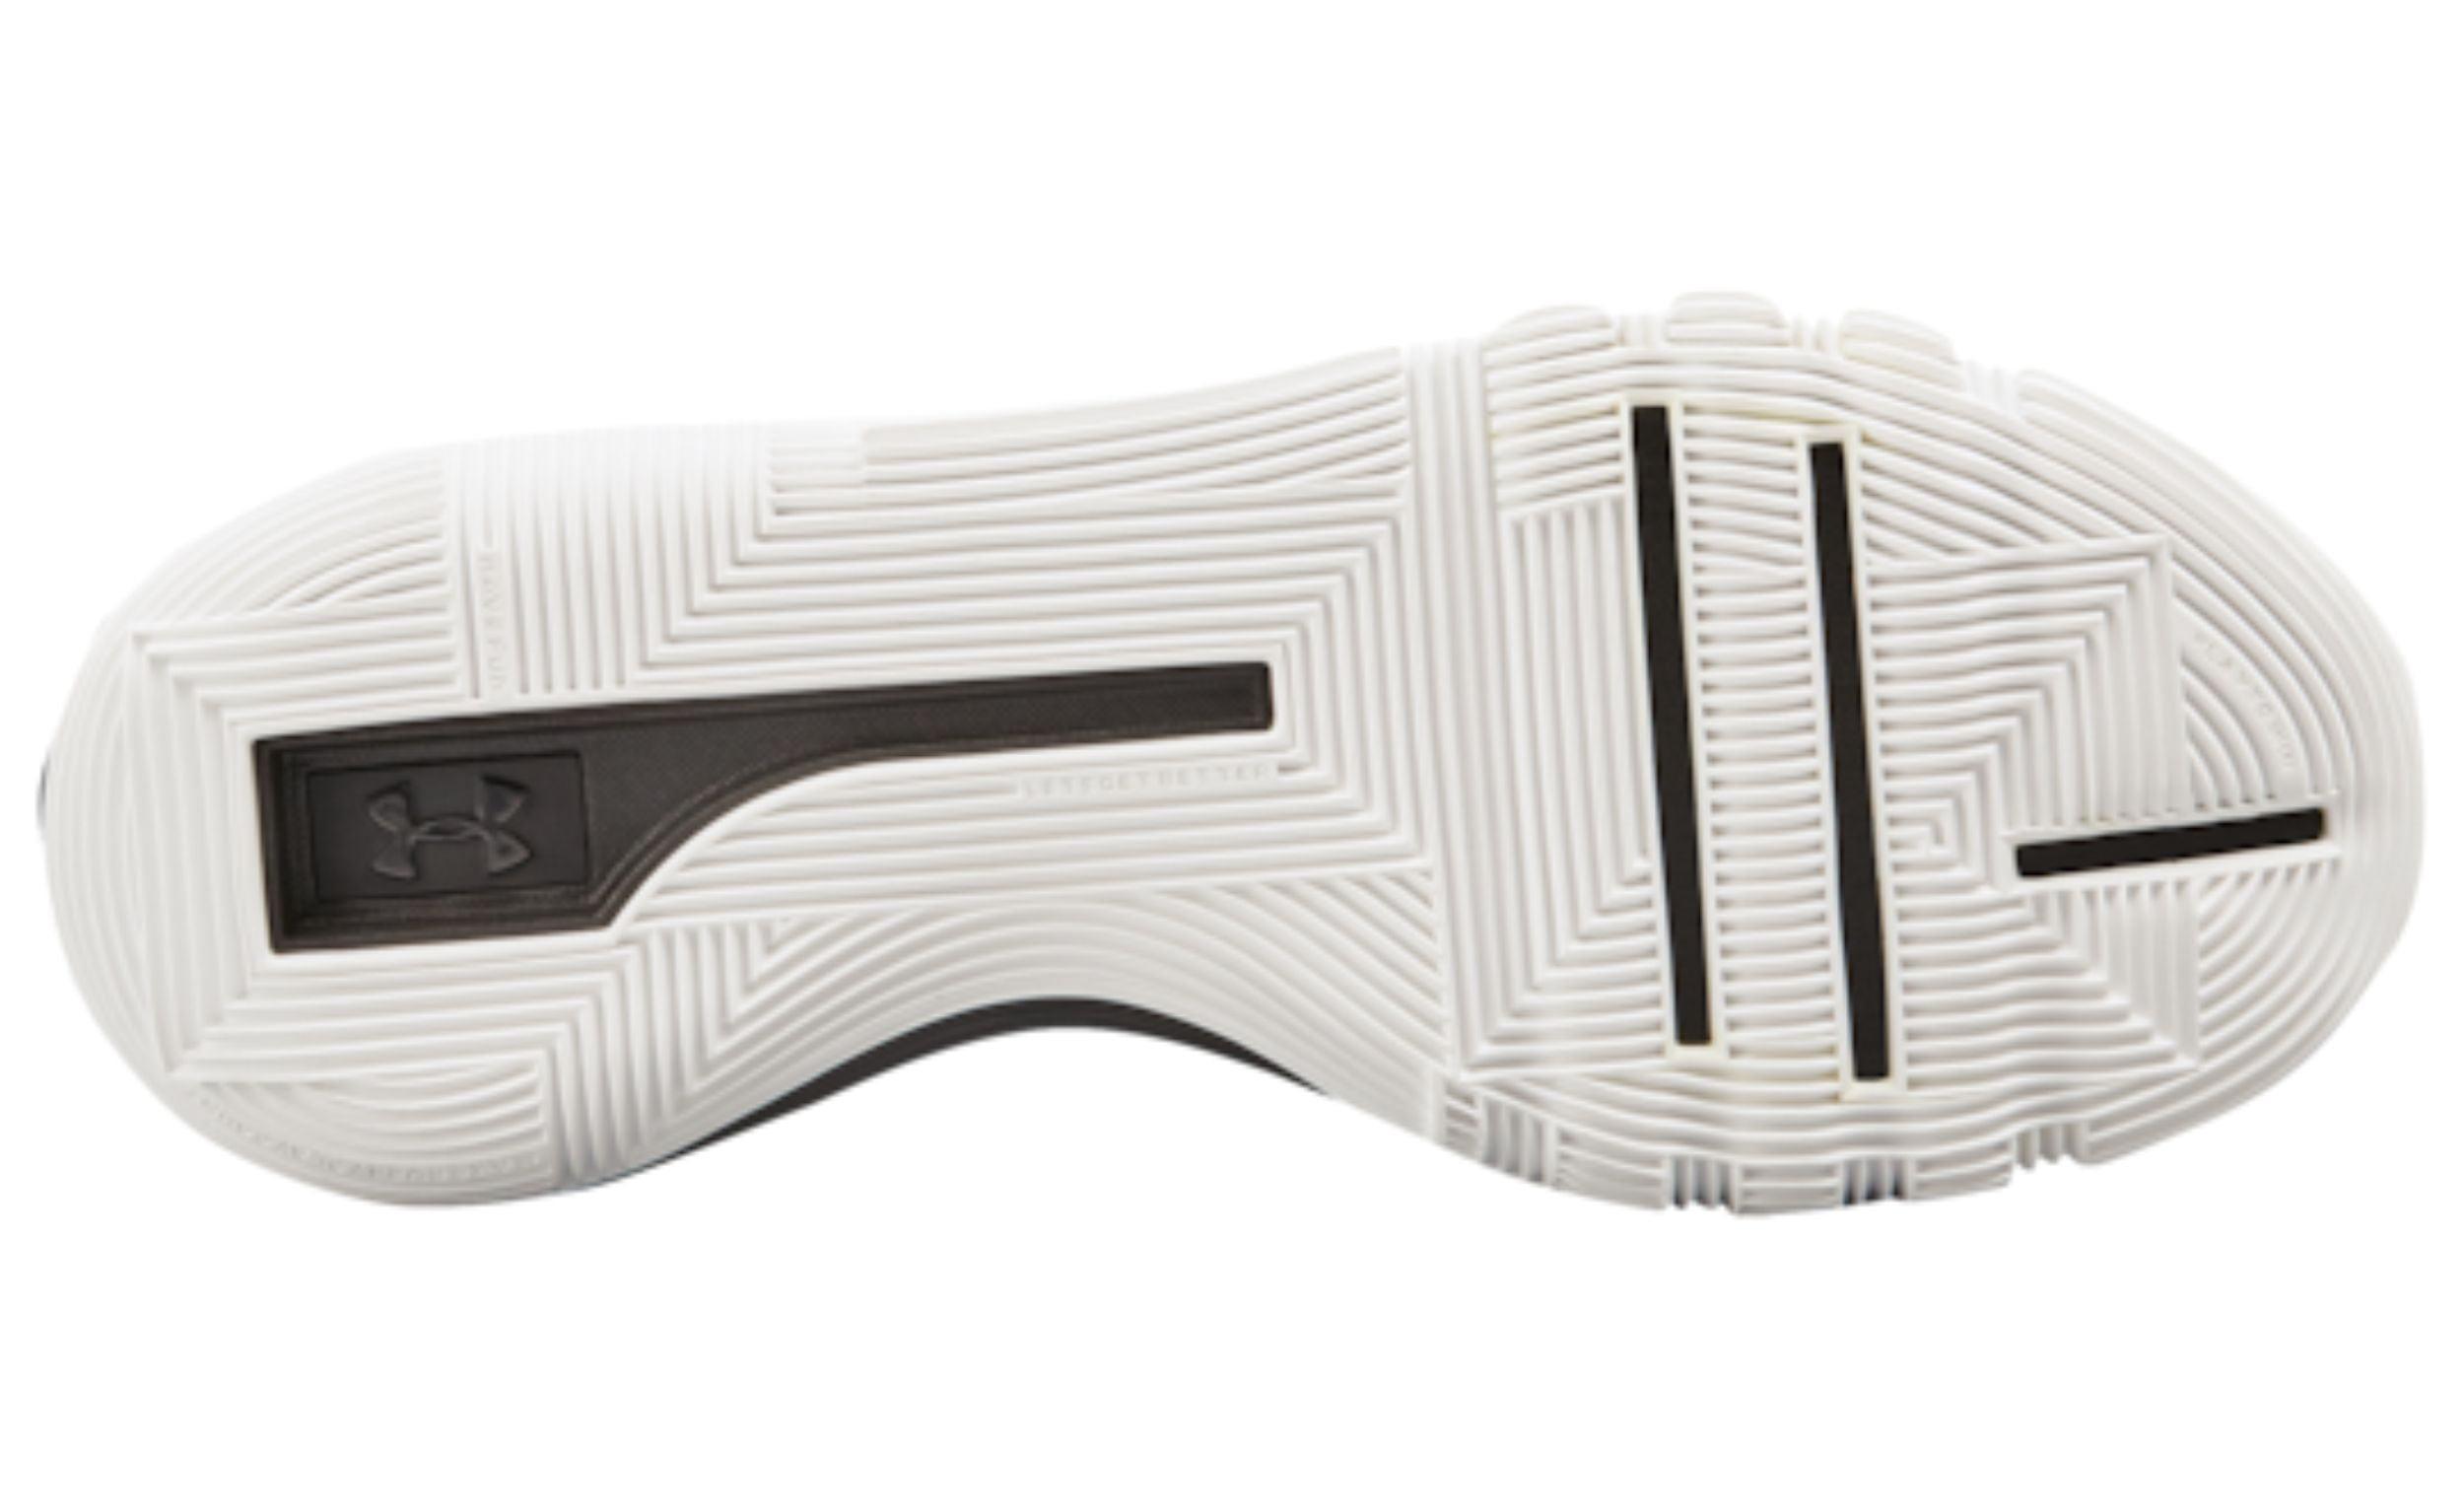 700744d235e Under Armour UA SC 3ZER0 II Men s Basketball Shoes Black White 3020613-001  (8.5 D(M) US) - Walmart.com